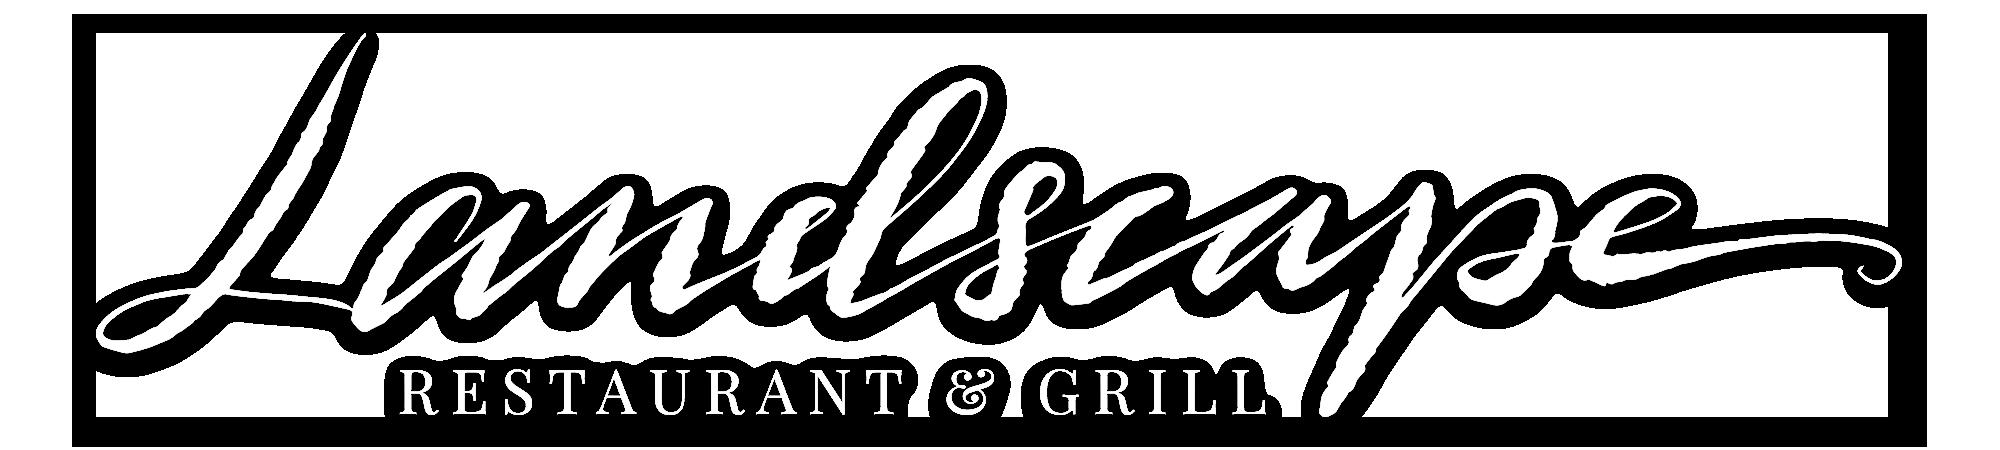 Landscape Restaurant Logo